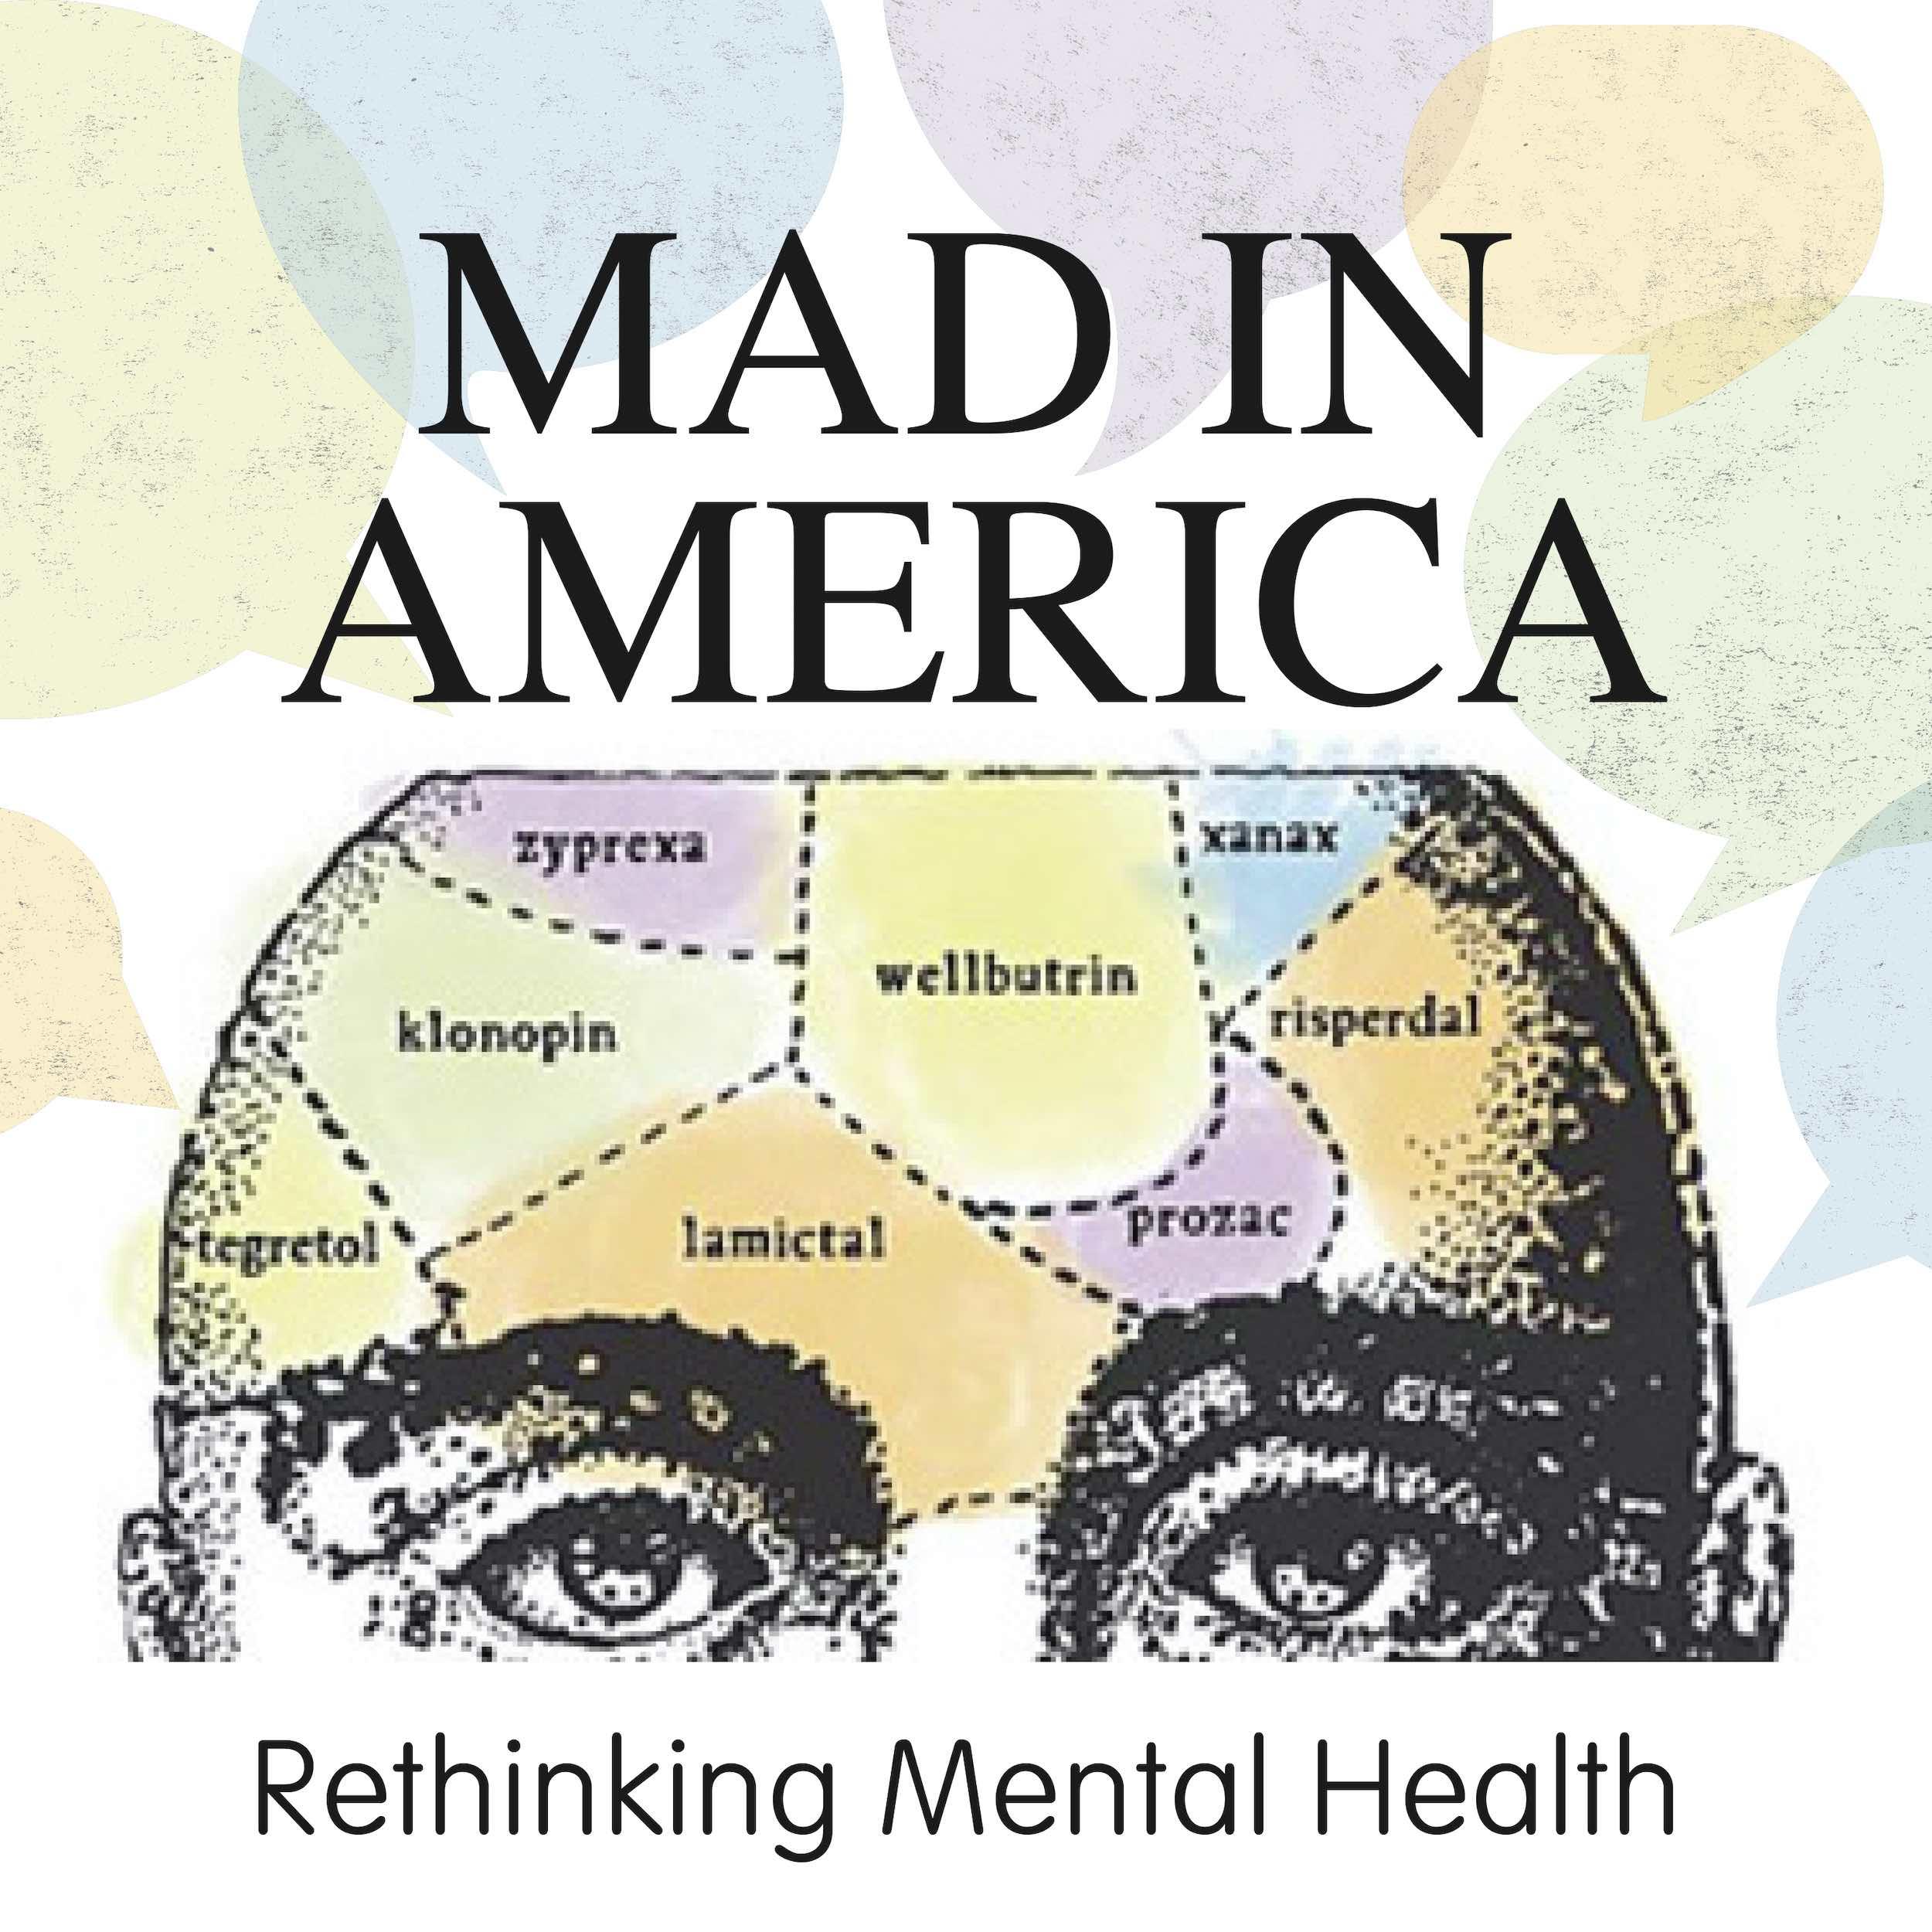 Mad in America: Rethinking Mental Health - Stuart Shipko - SSRI Withdrawal: Shooting the Odds